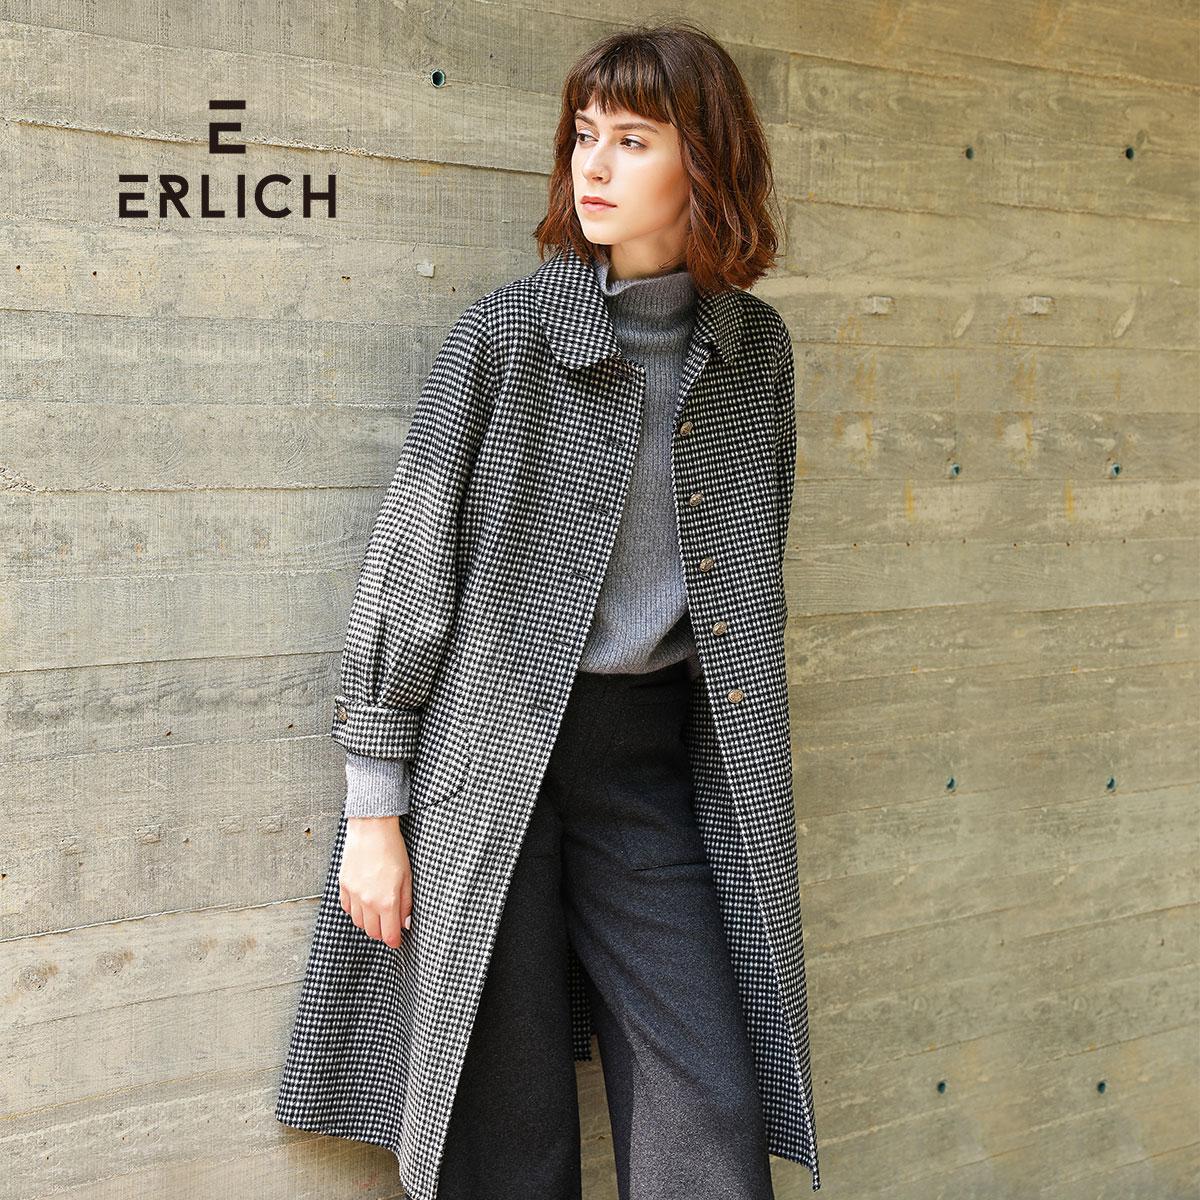 erlich2018秋冬季大衣外套灰白方格千鸟格条纹中长款毛呢外套女